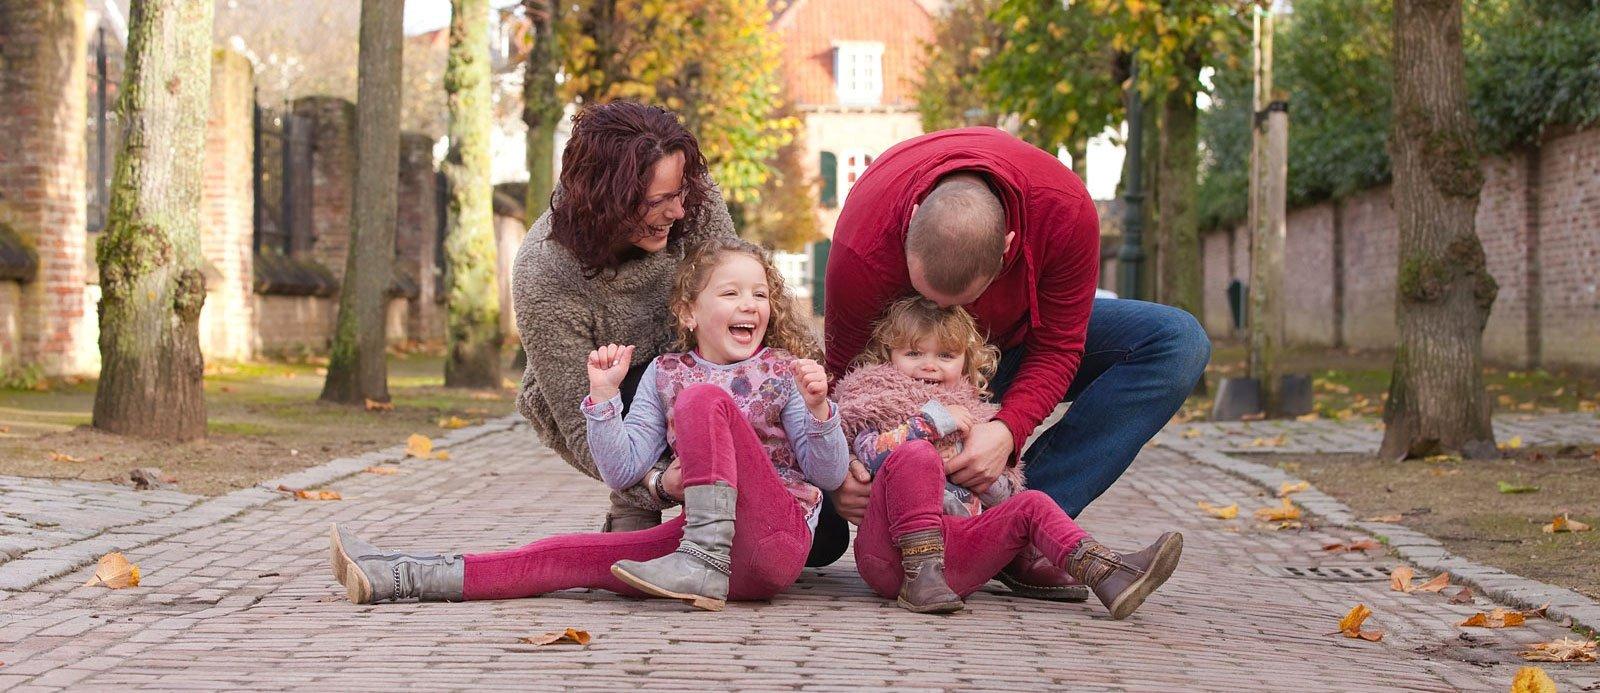 Familie reportage door Anneke Troost